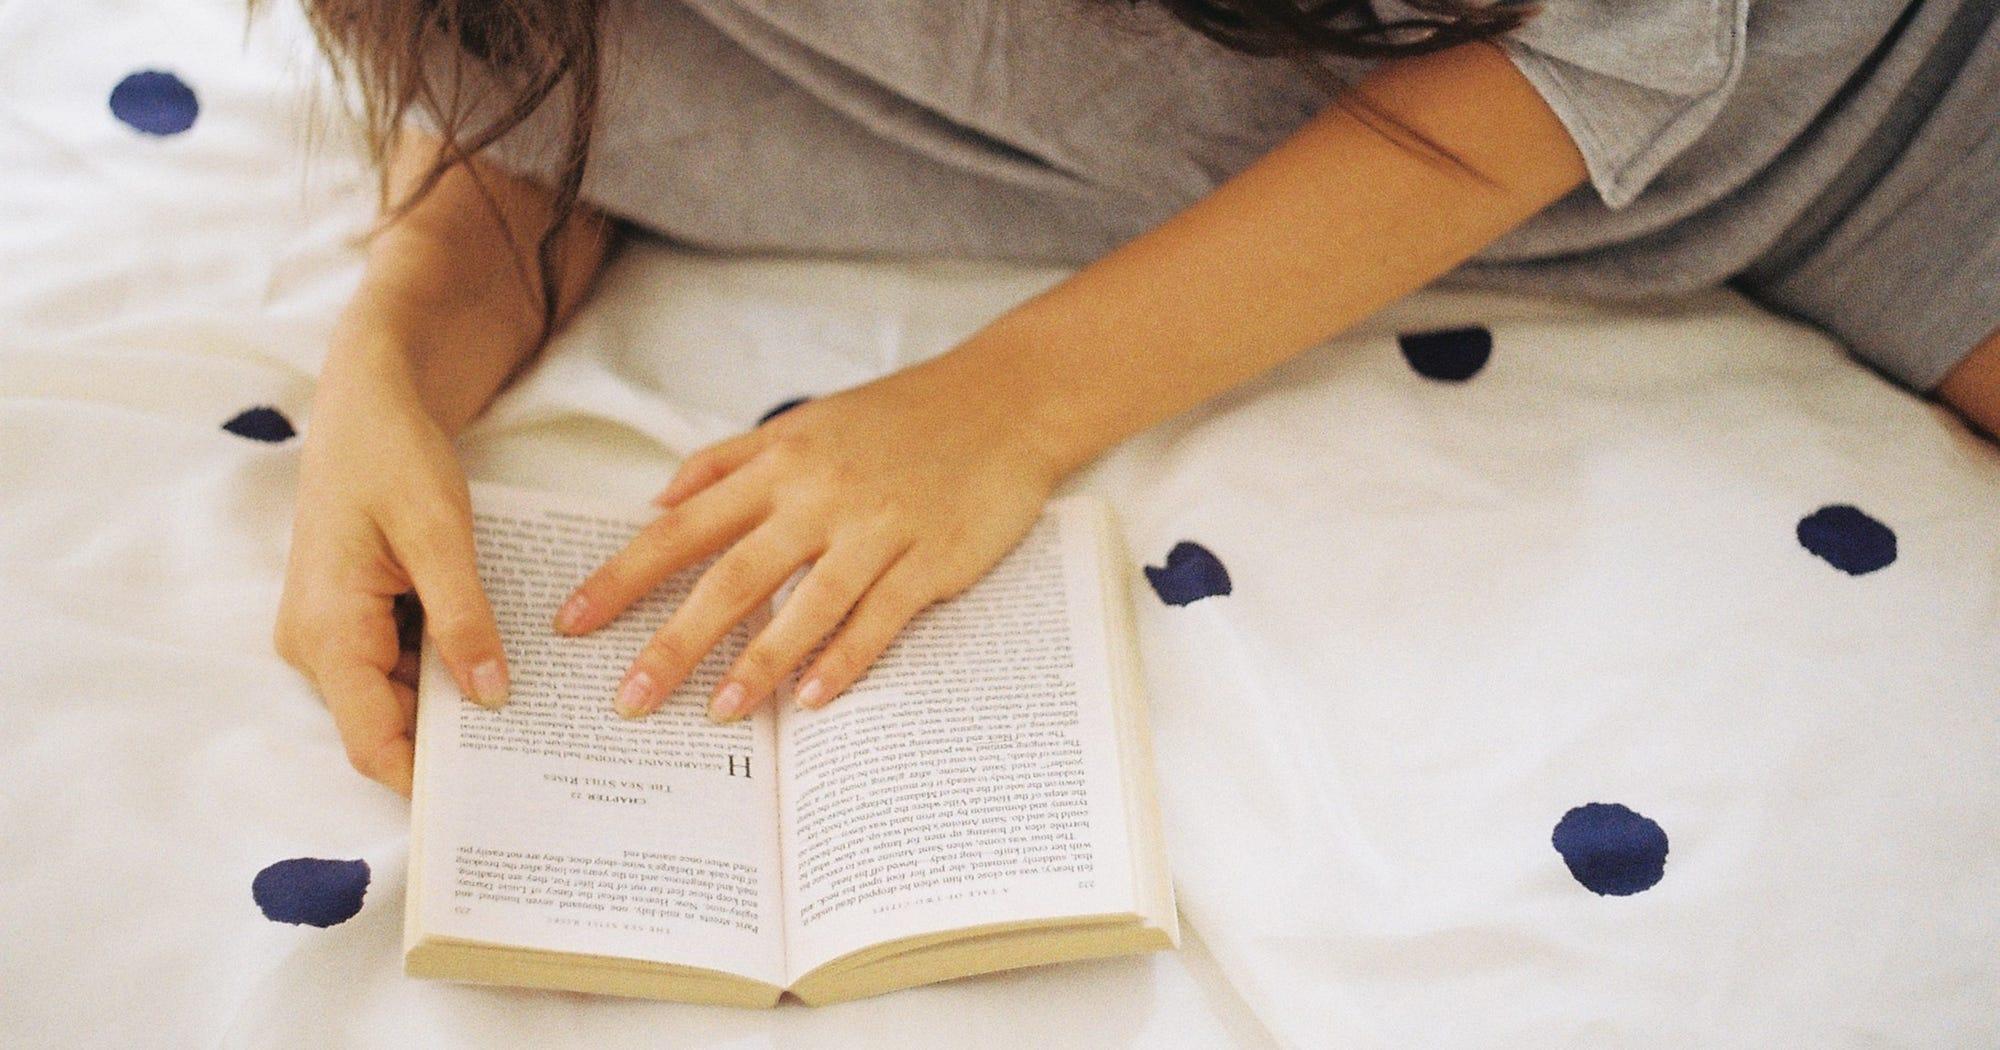 Famous writen sex scenes from books